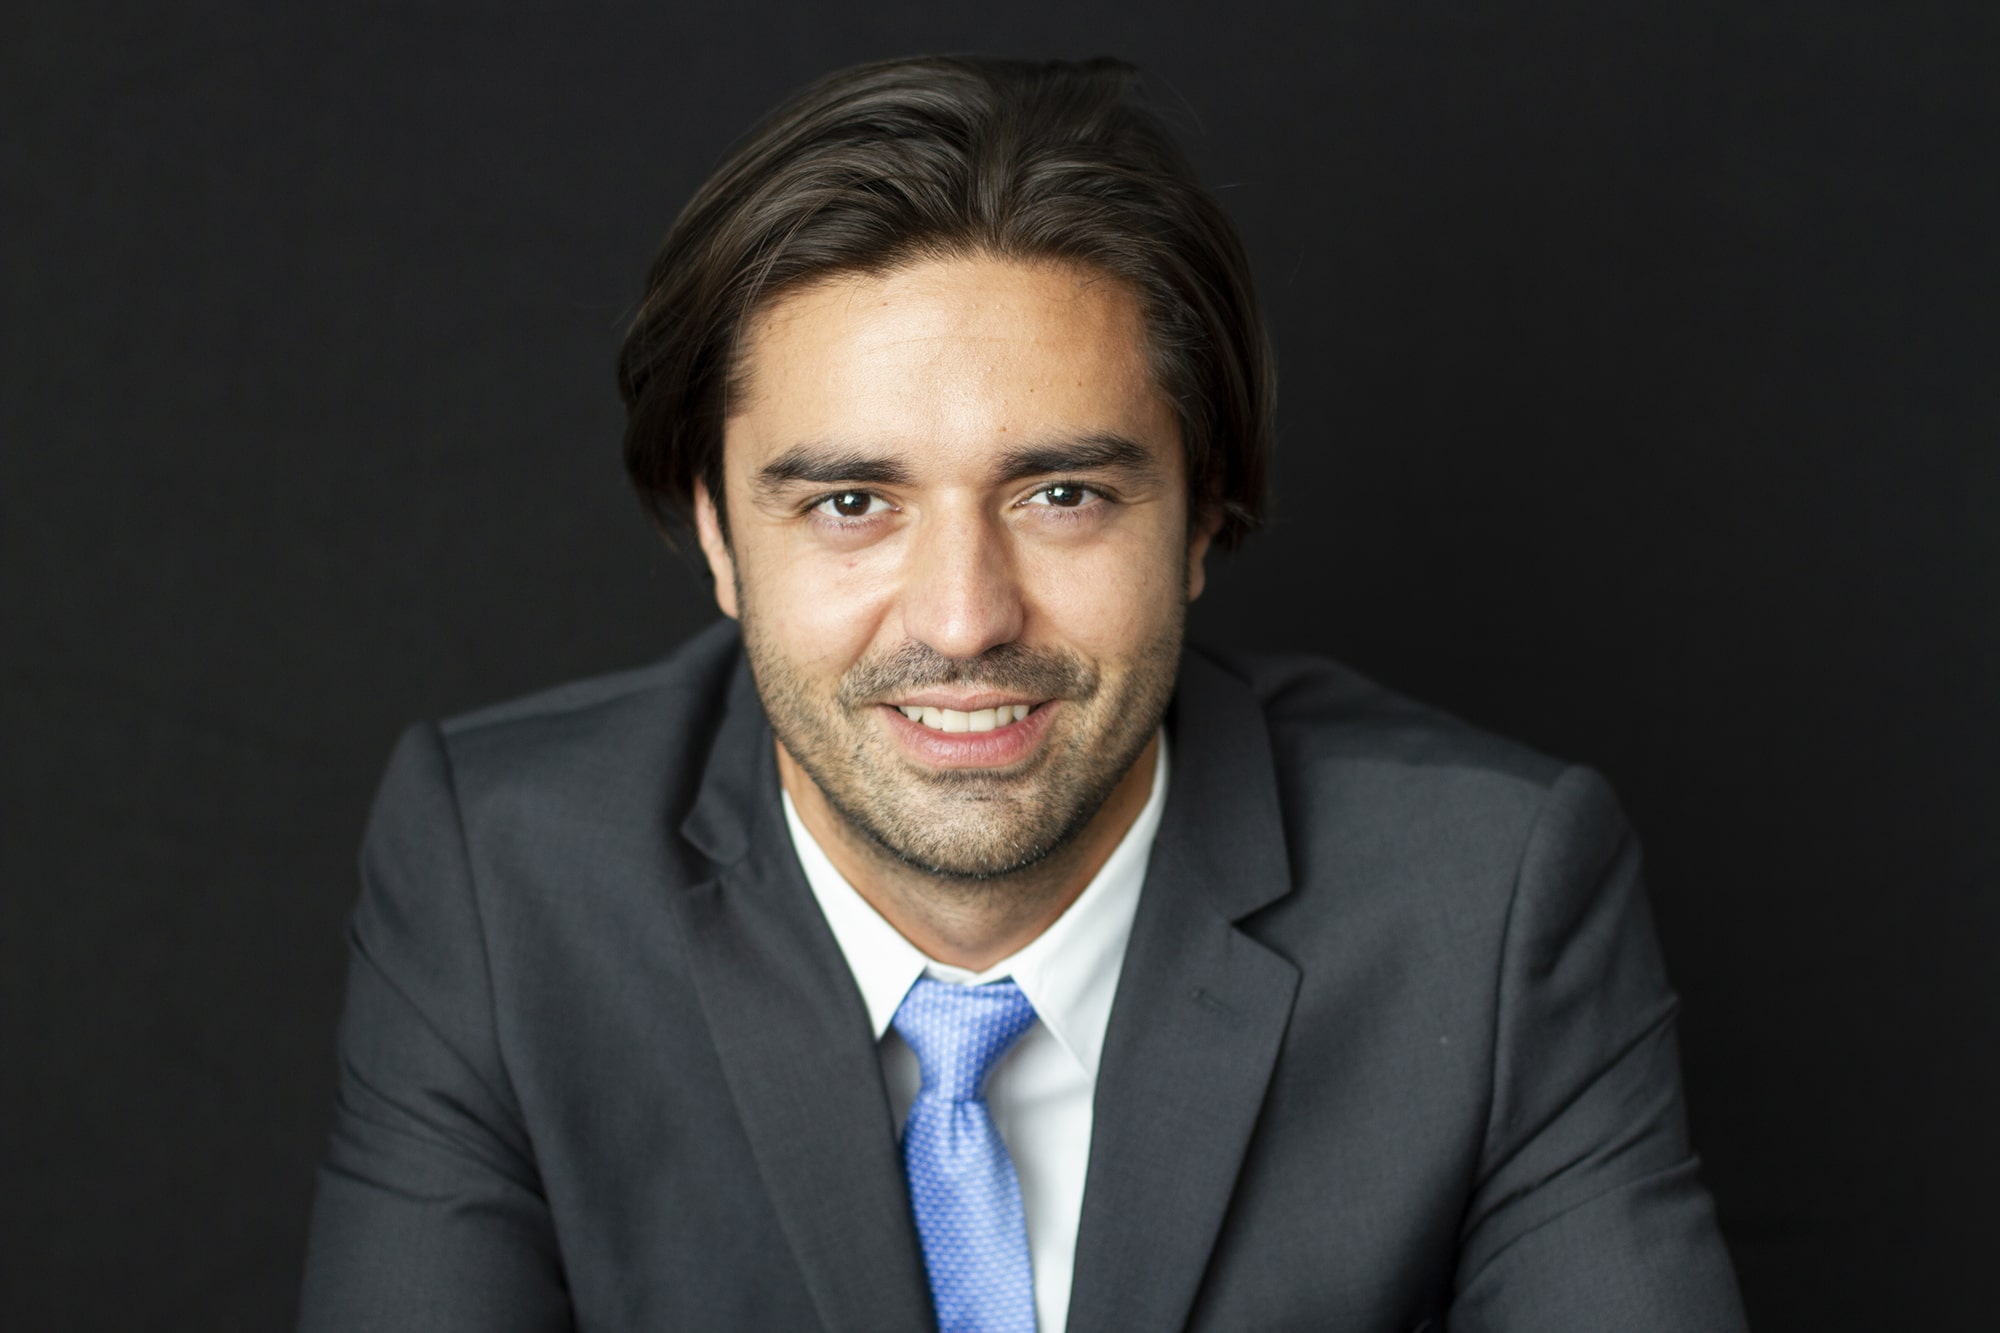 Philippe Nadeau